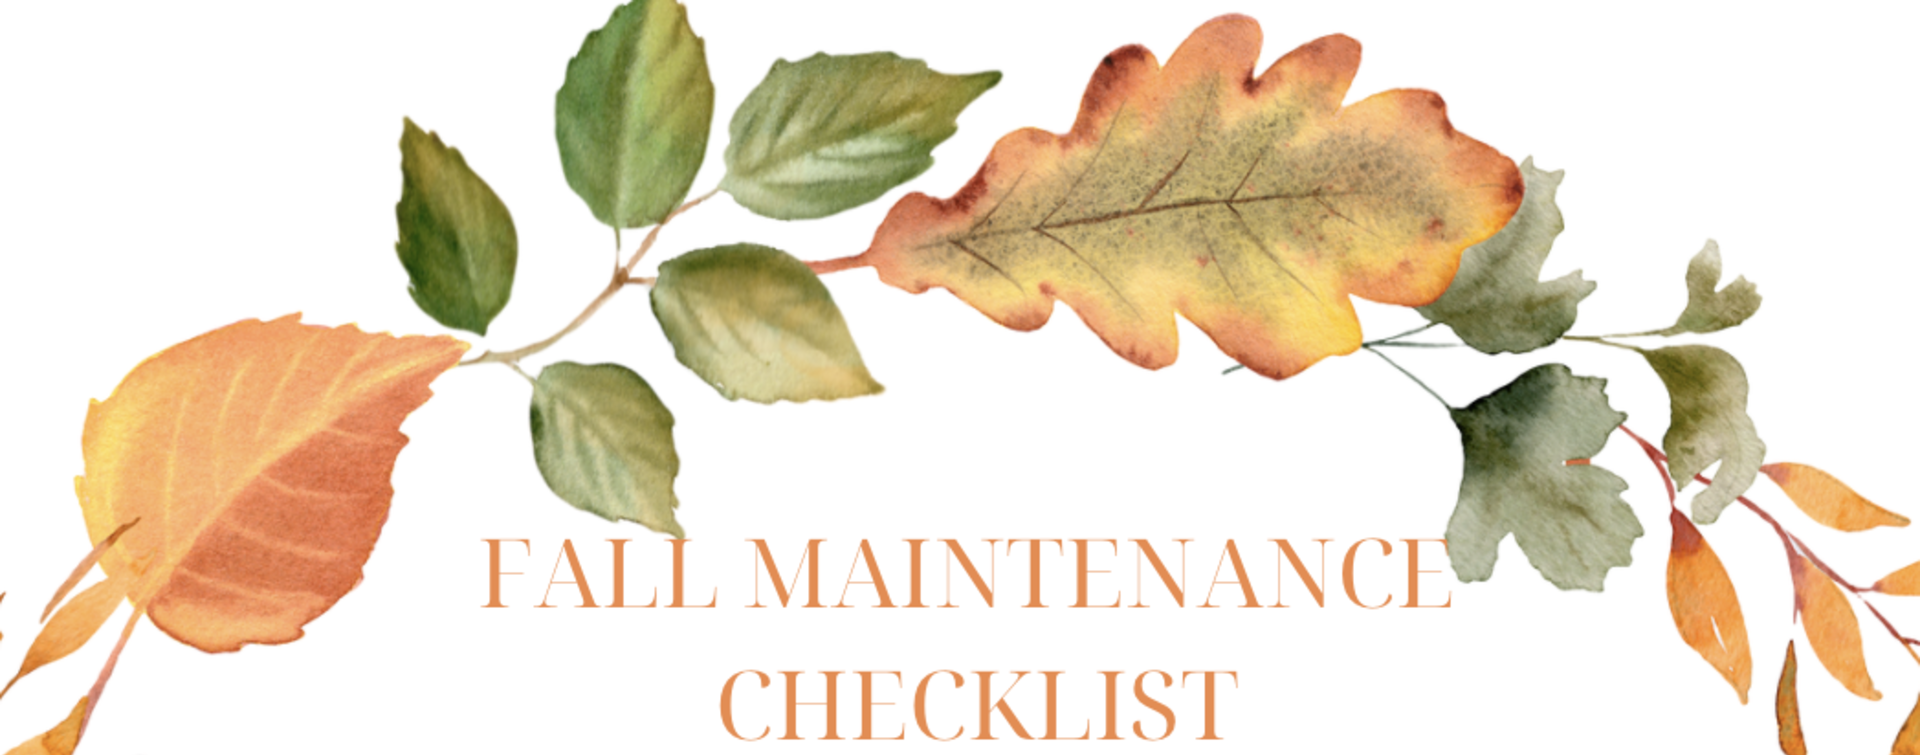 Fall Edition Maintenance Checklist